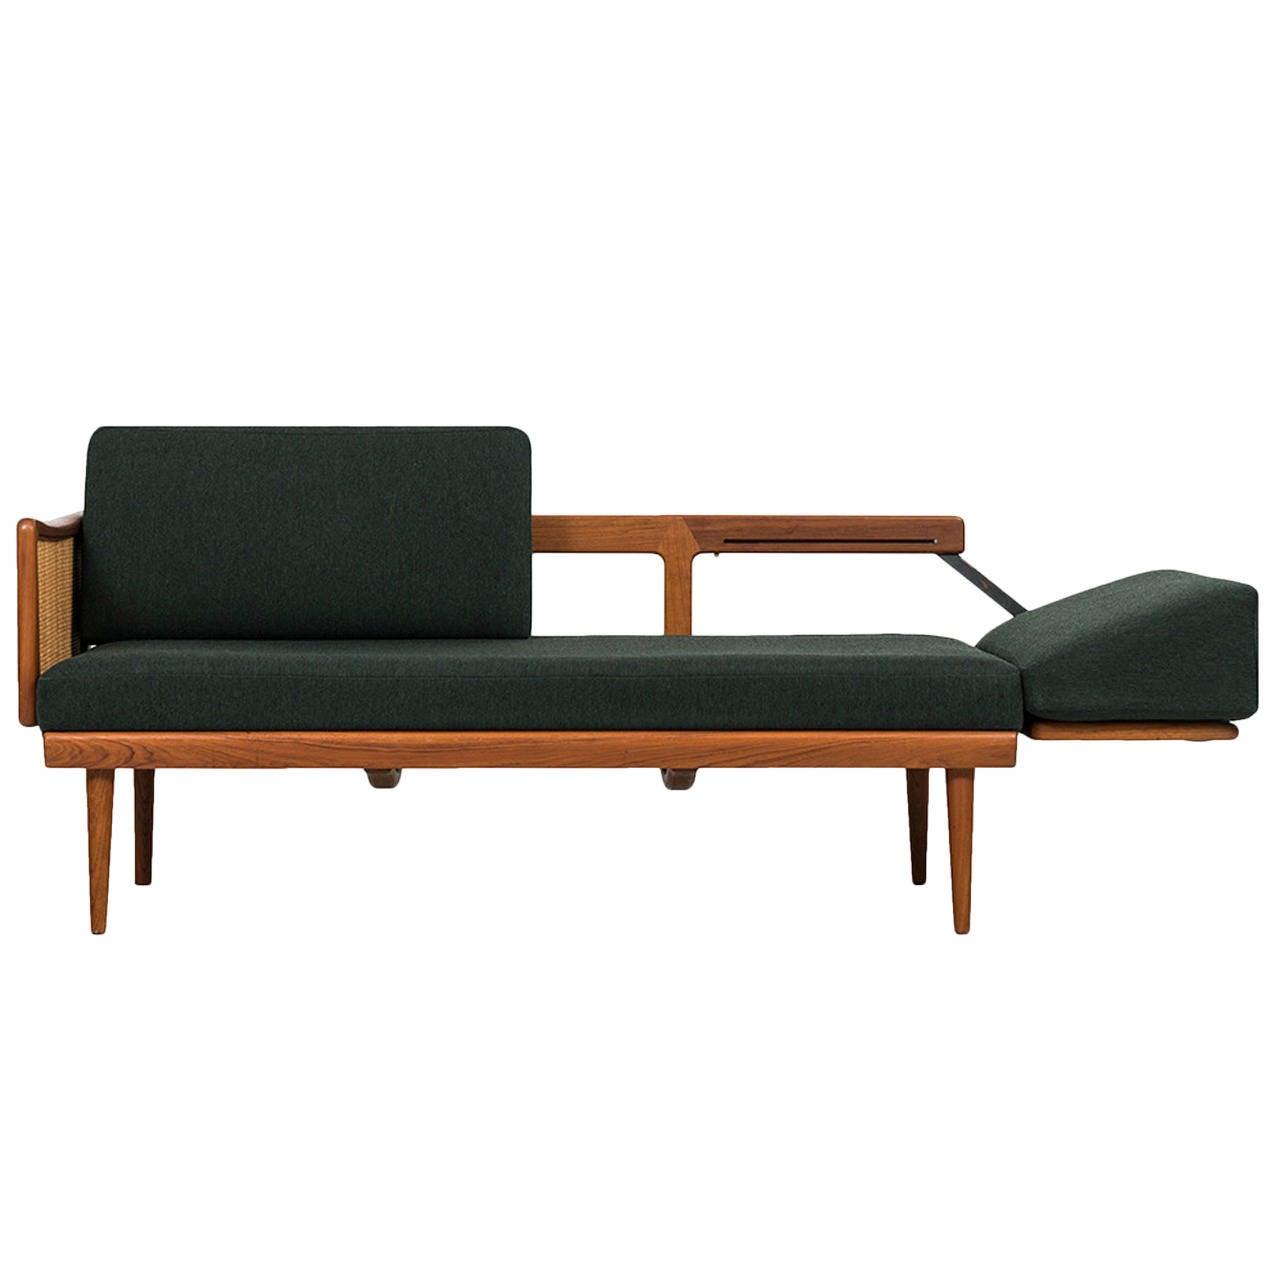 Peter Hvidt & Orla Mølgaard-Nielsen sofa model FD 451